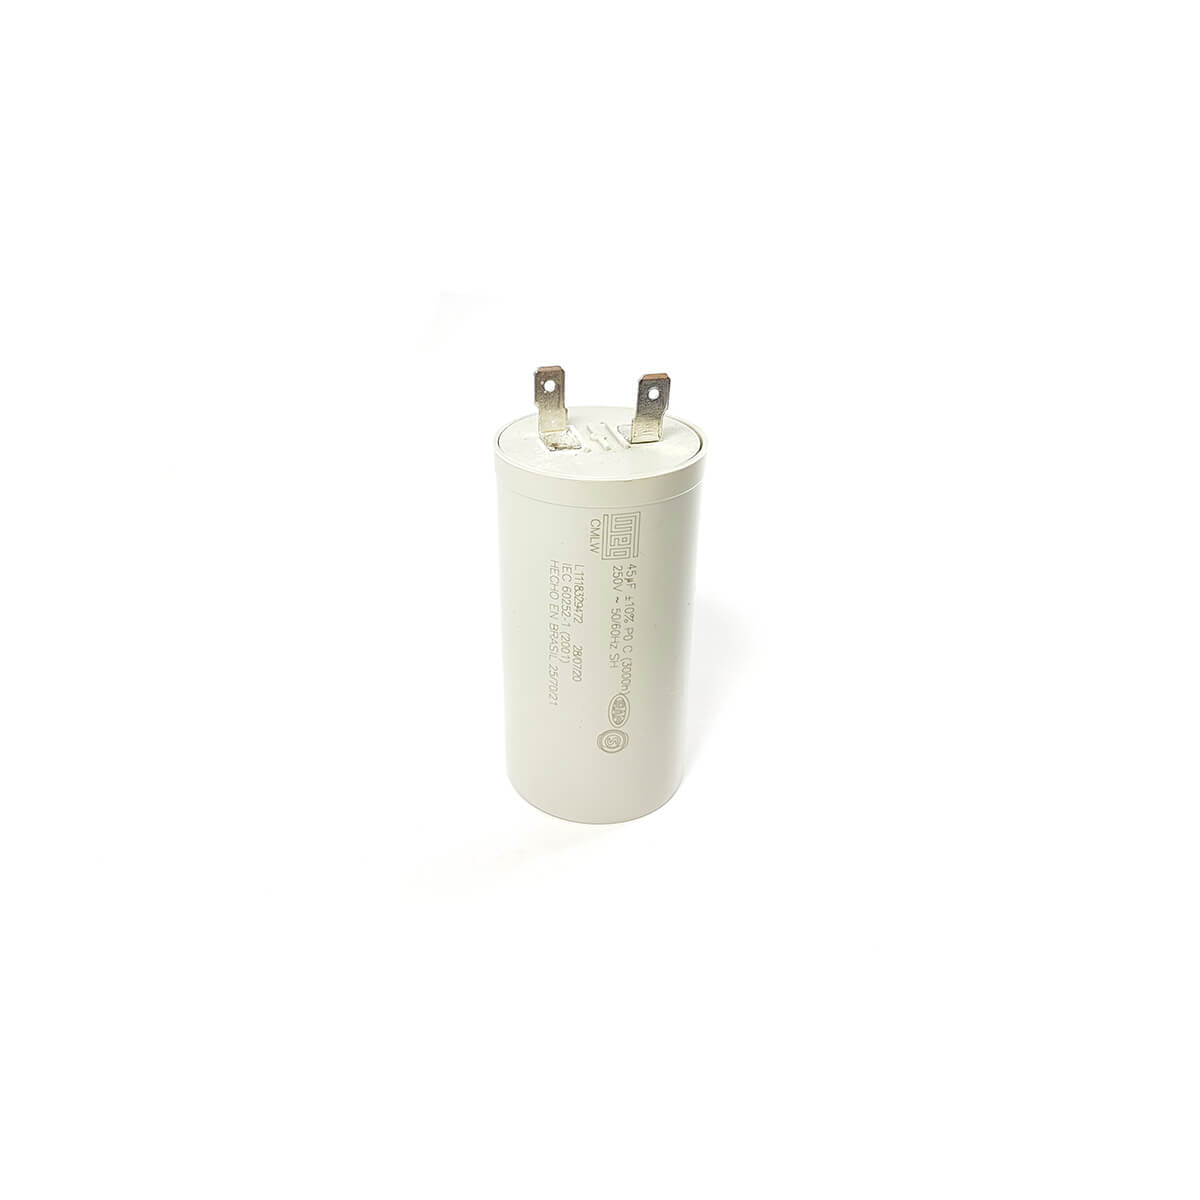 Capacitor Simples WEG 45MF 250V 50/60Hz 40x78mm Para Lavadora de Roupas Brastemp - 326066187